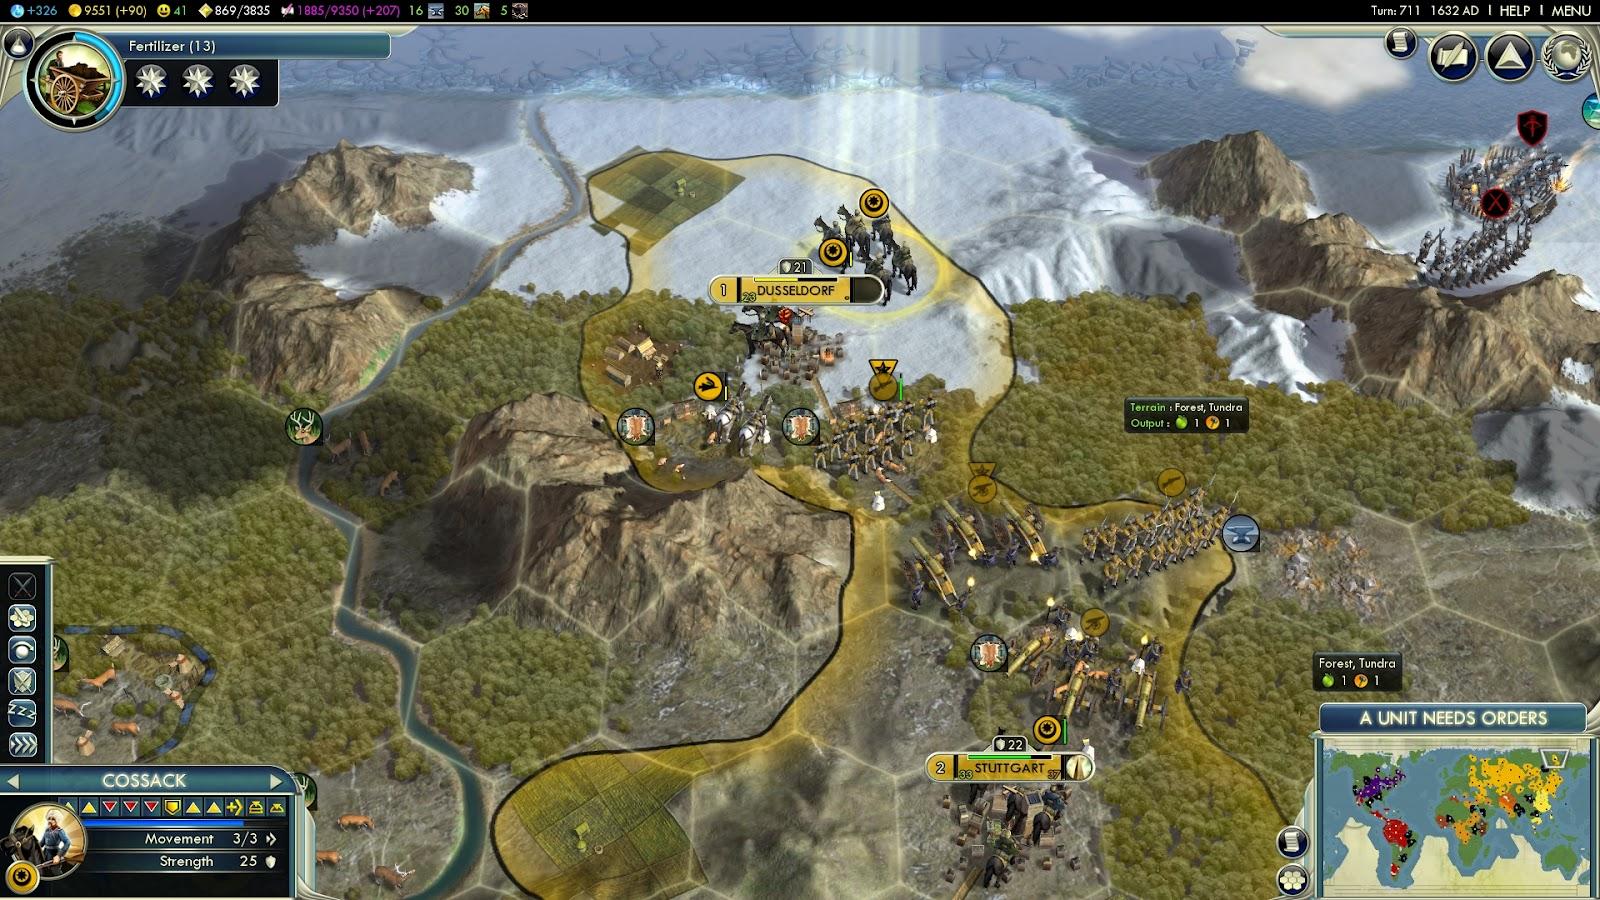 Civ5] Whatever happened to Bismarck? 1616-1640AD